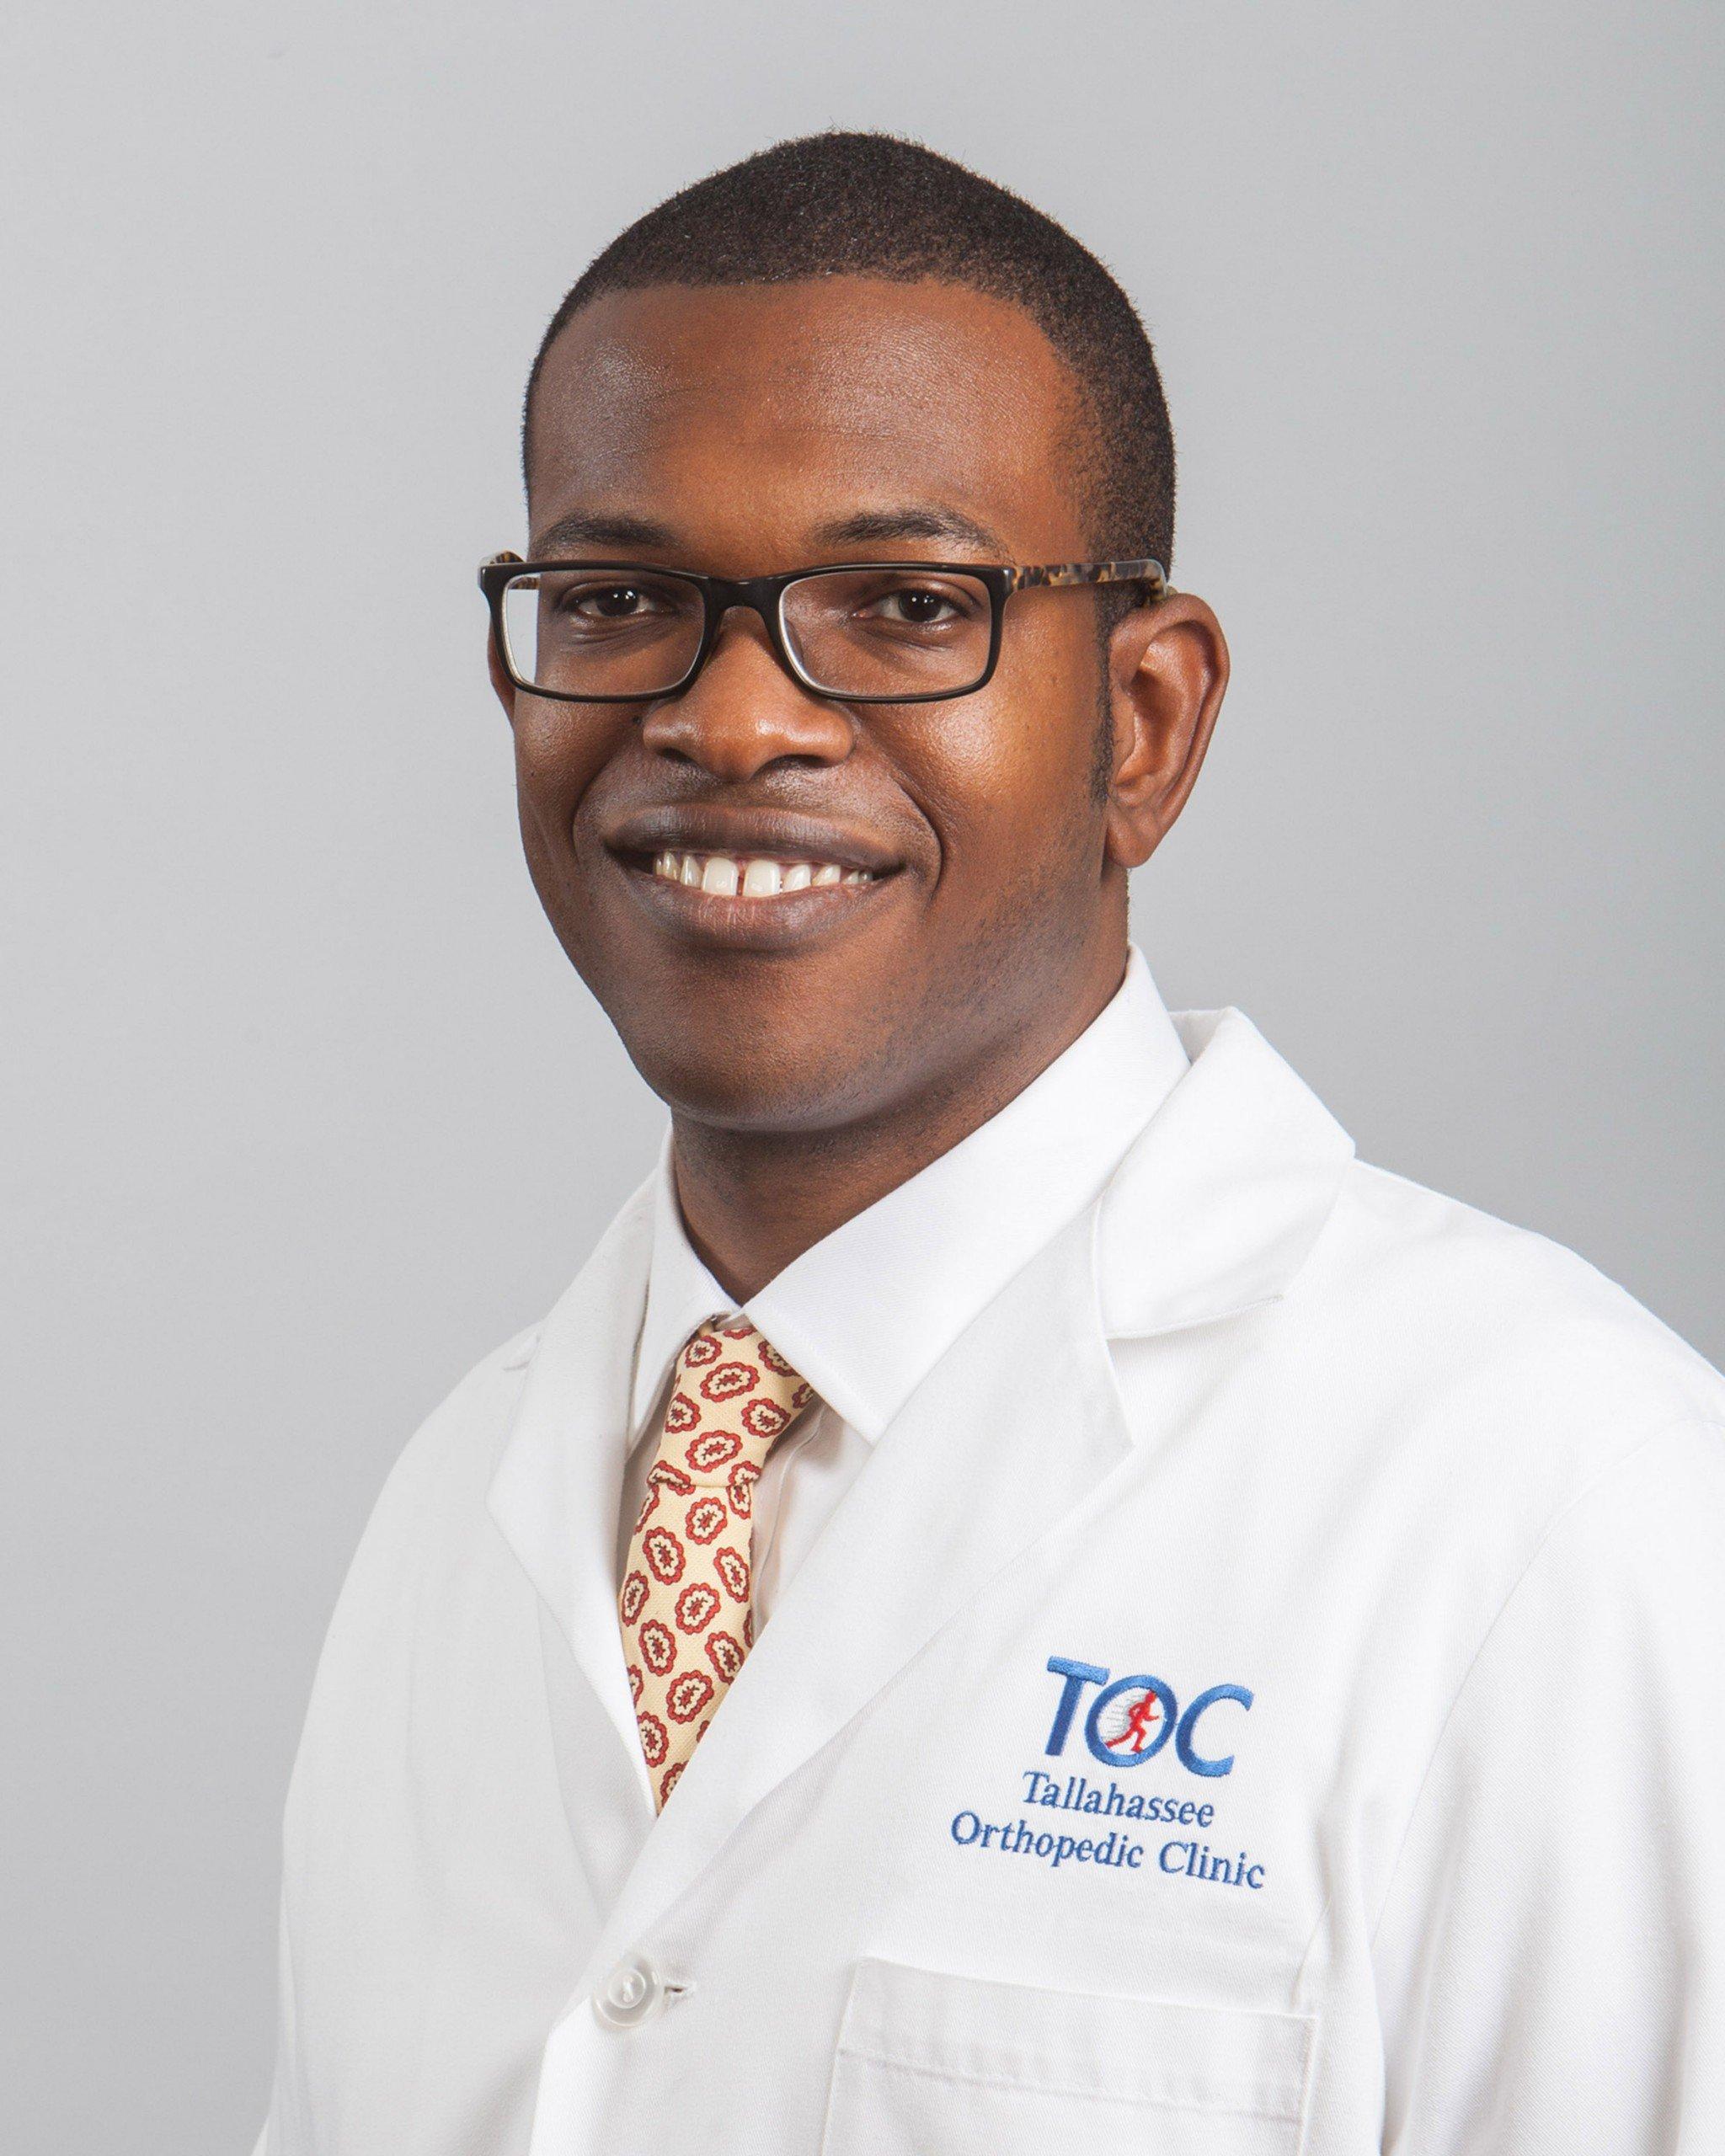 Tony L. Bryant, MD